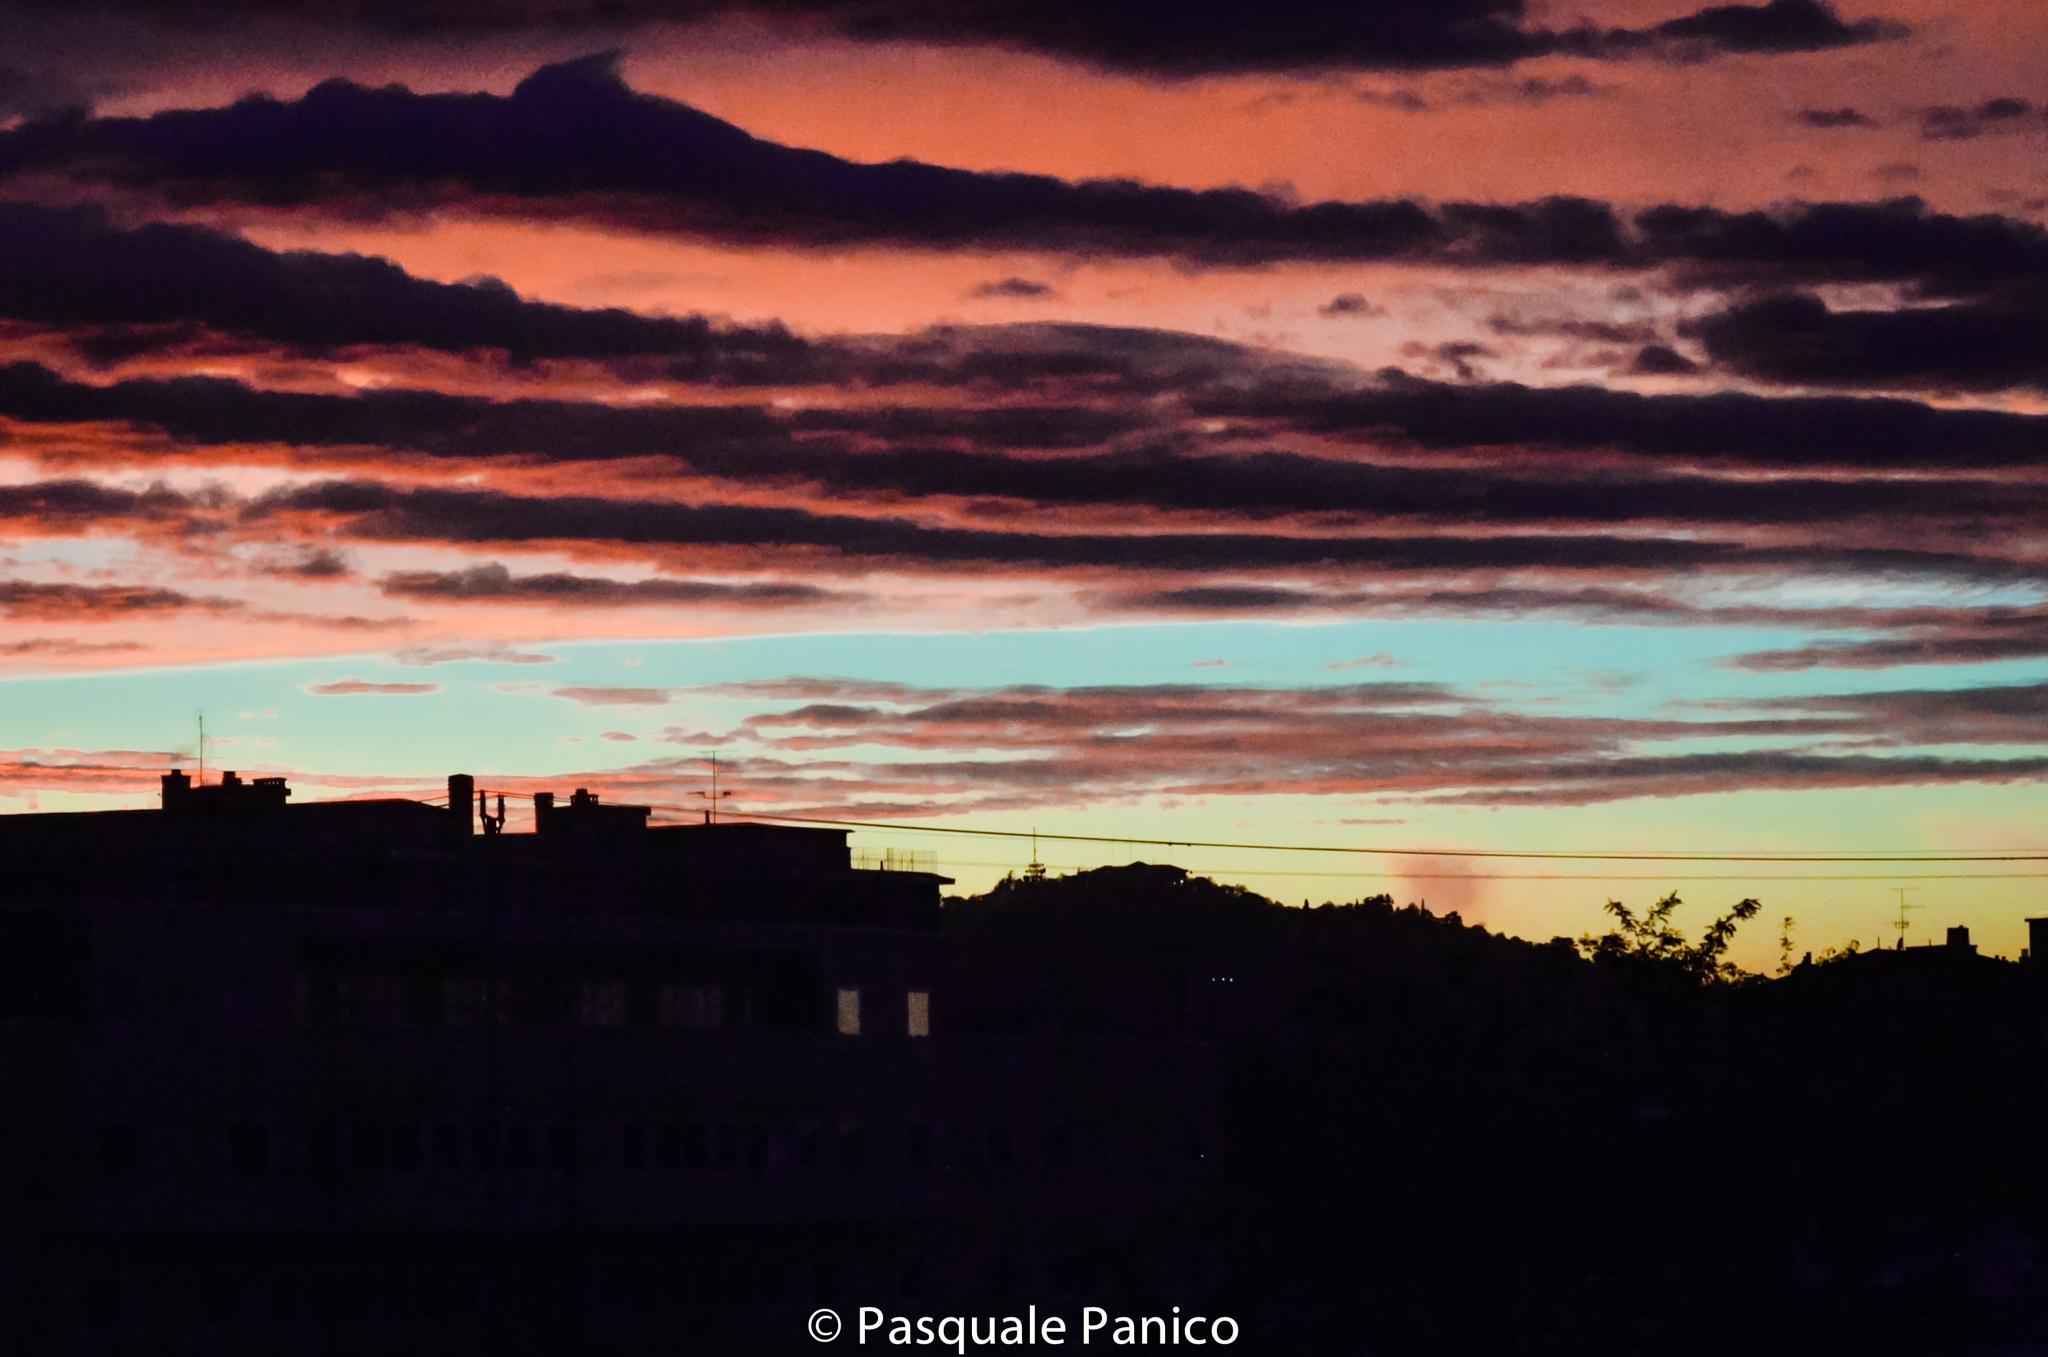 art of sunset by Pasquale Panico